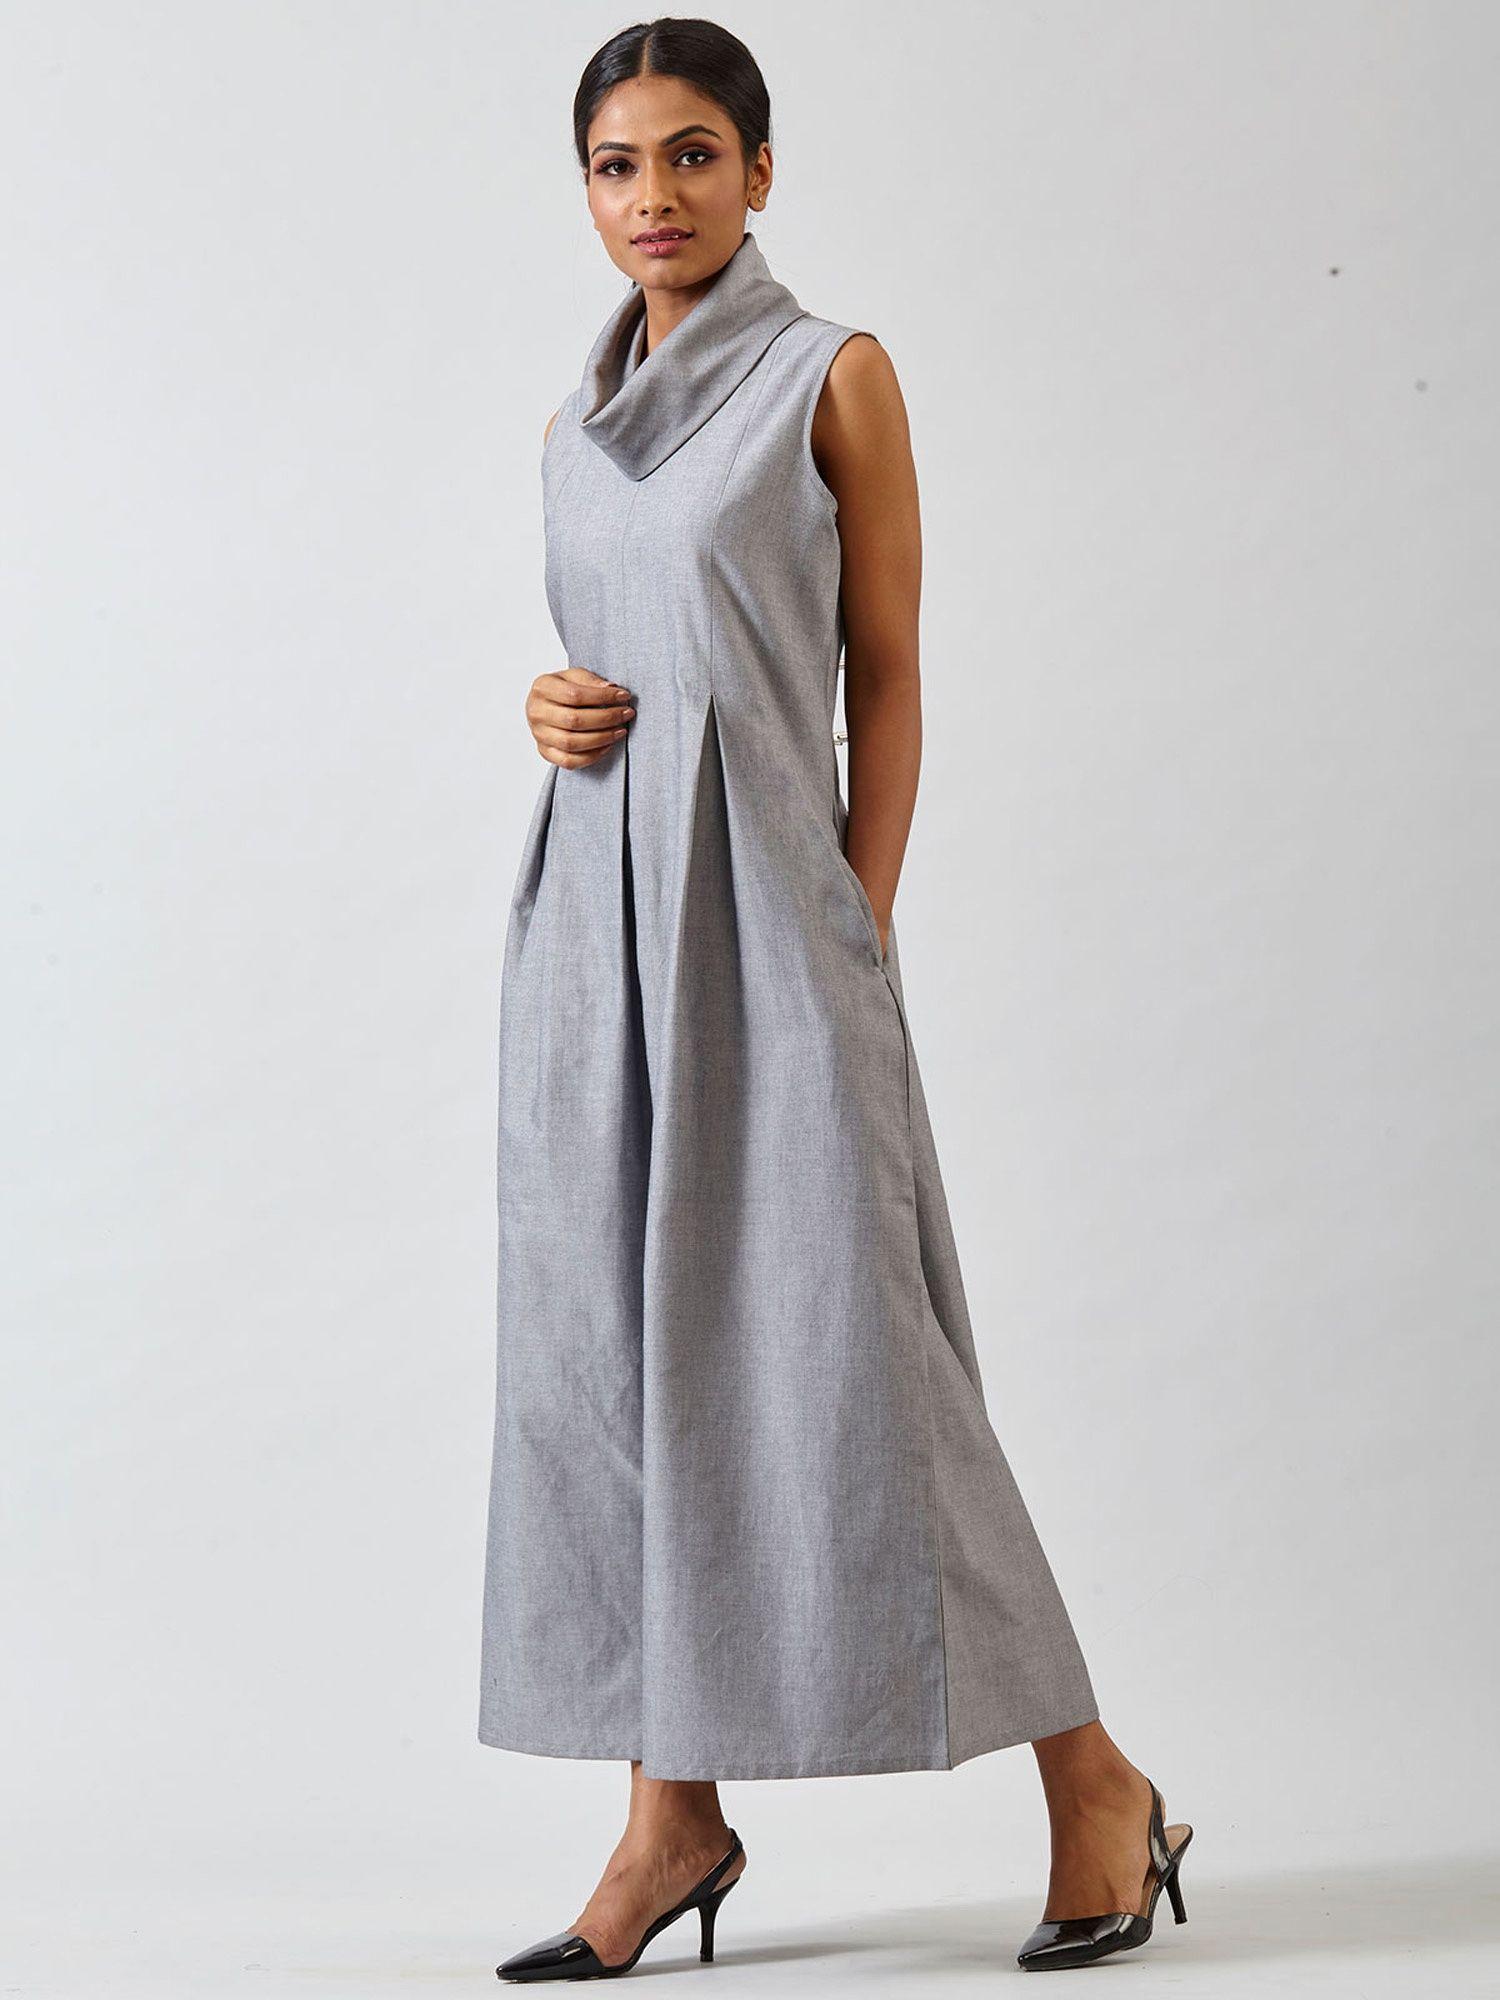 00b267f0f6 FableStreet Dresses   Buy FableStreet Cowl Neck Pleated Maxi Dress - Grey  Online